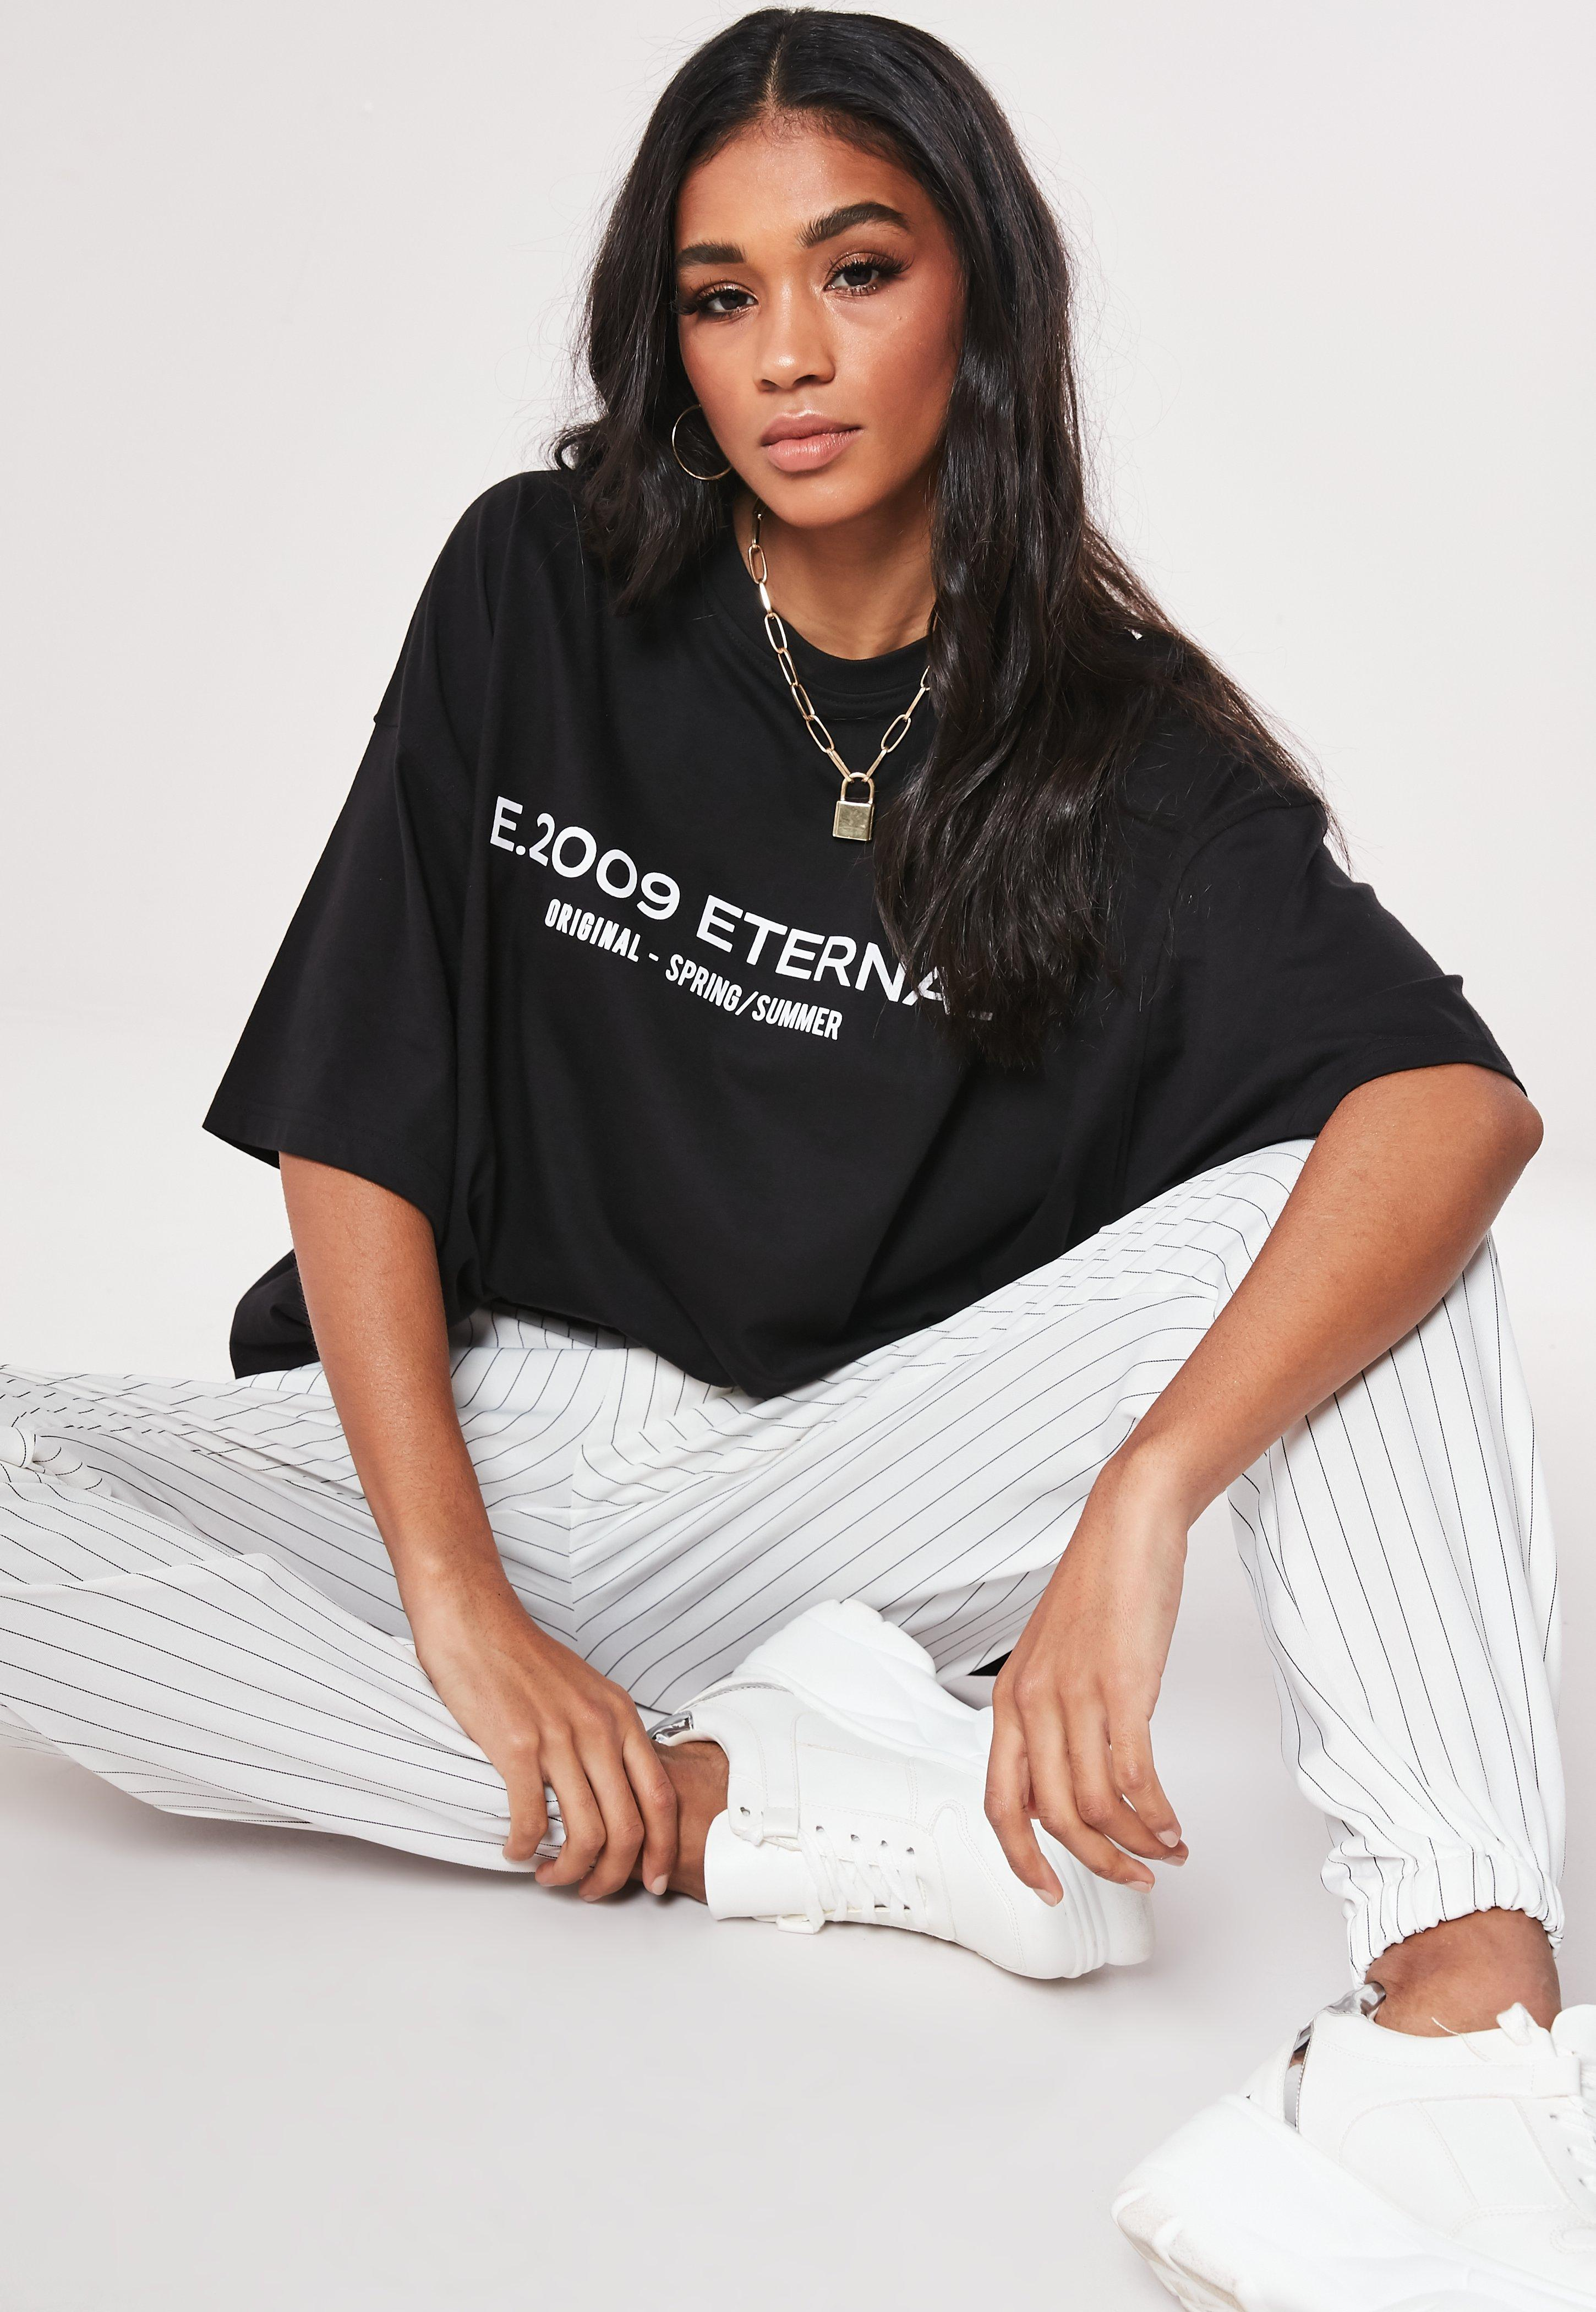 694a9ce5 Lyst - Missguided Petite Black Eternal Drop Shoulder T Shirt in Black